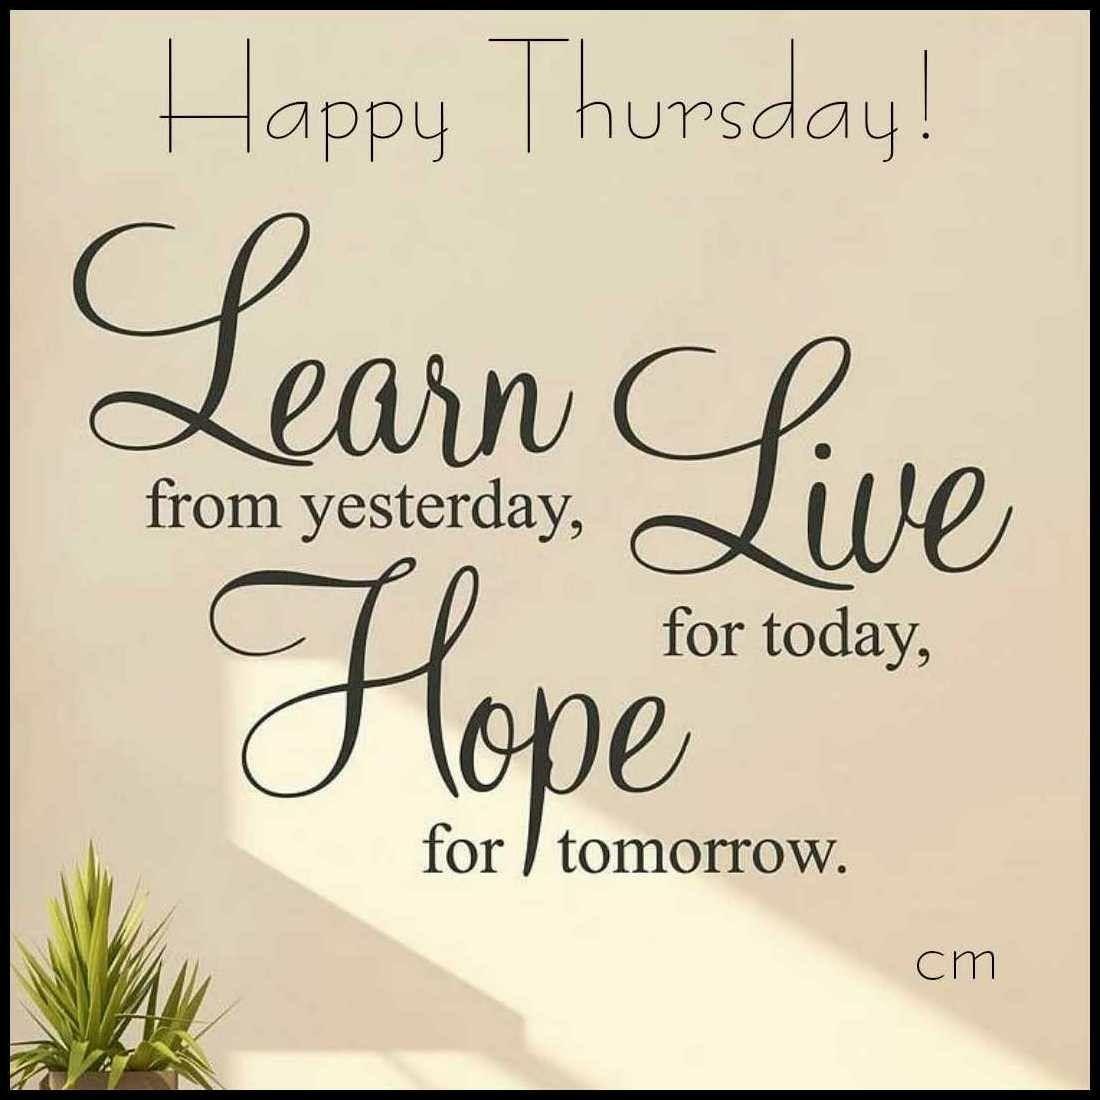 Motivational Inspirational Quotes: #goodmorning #happy #day #thursday #morninggrind #good